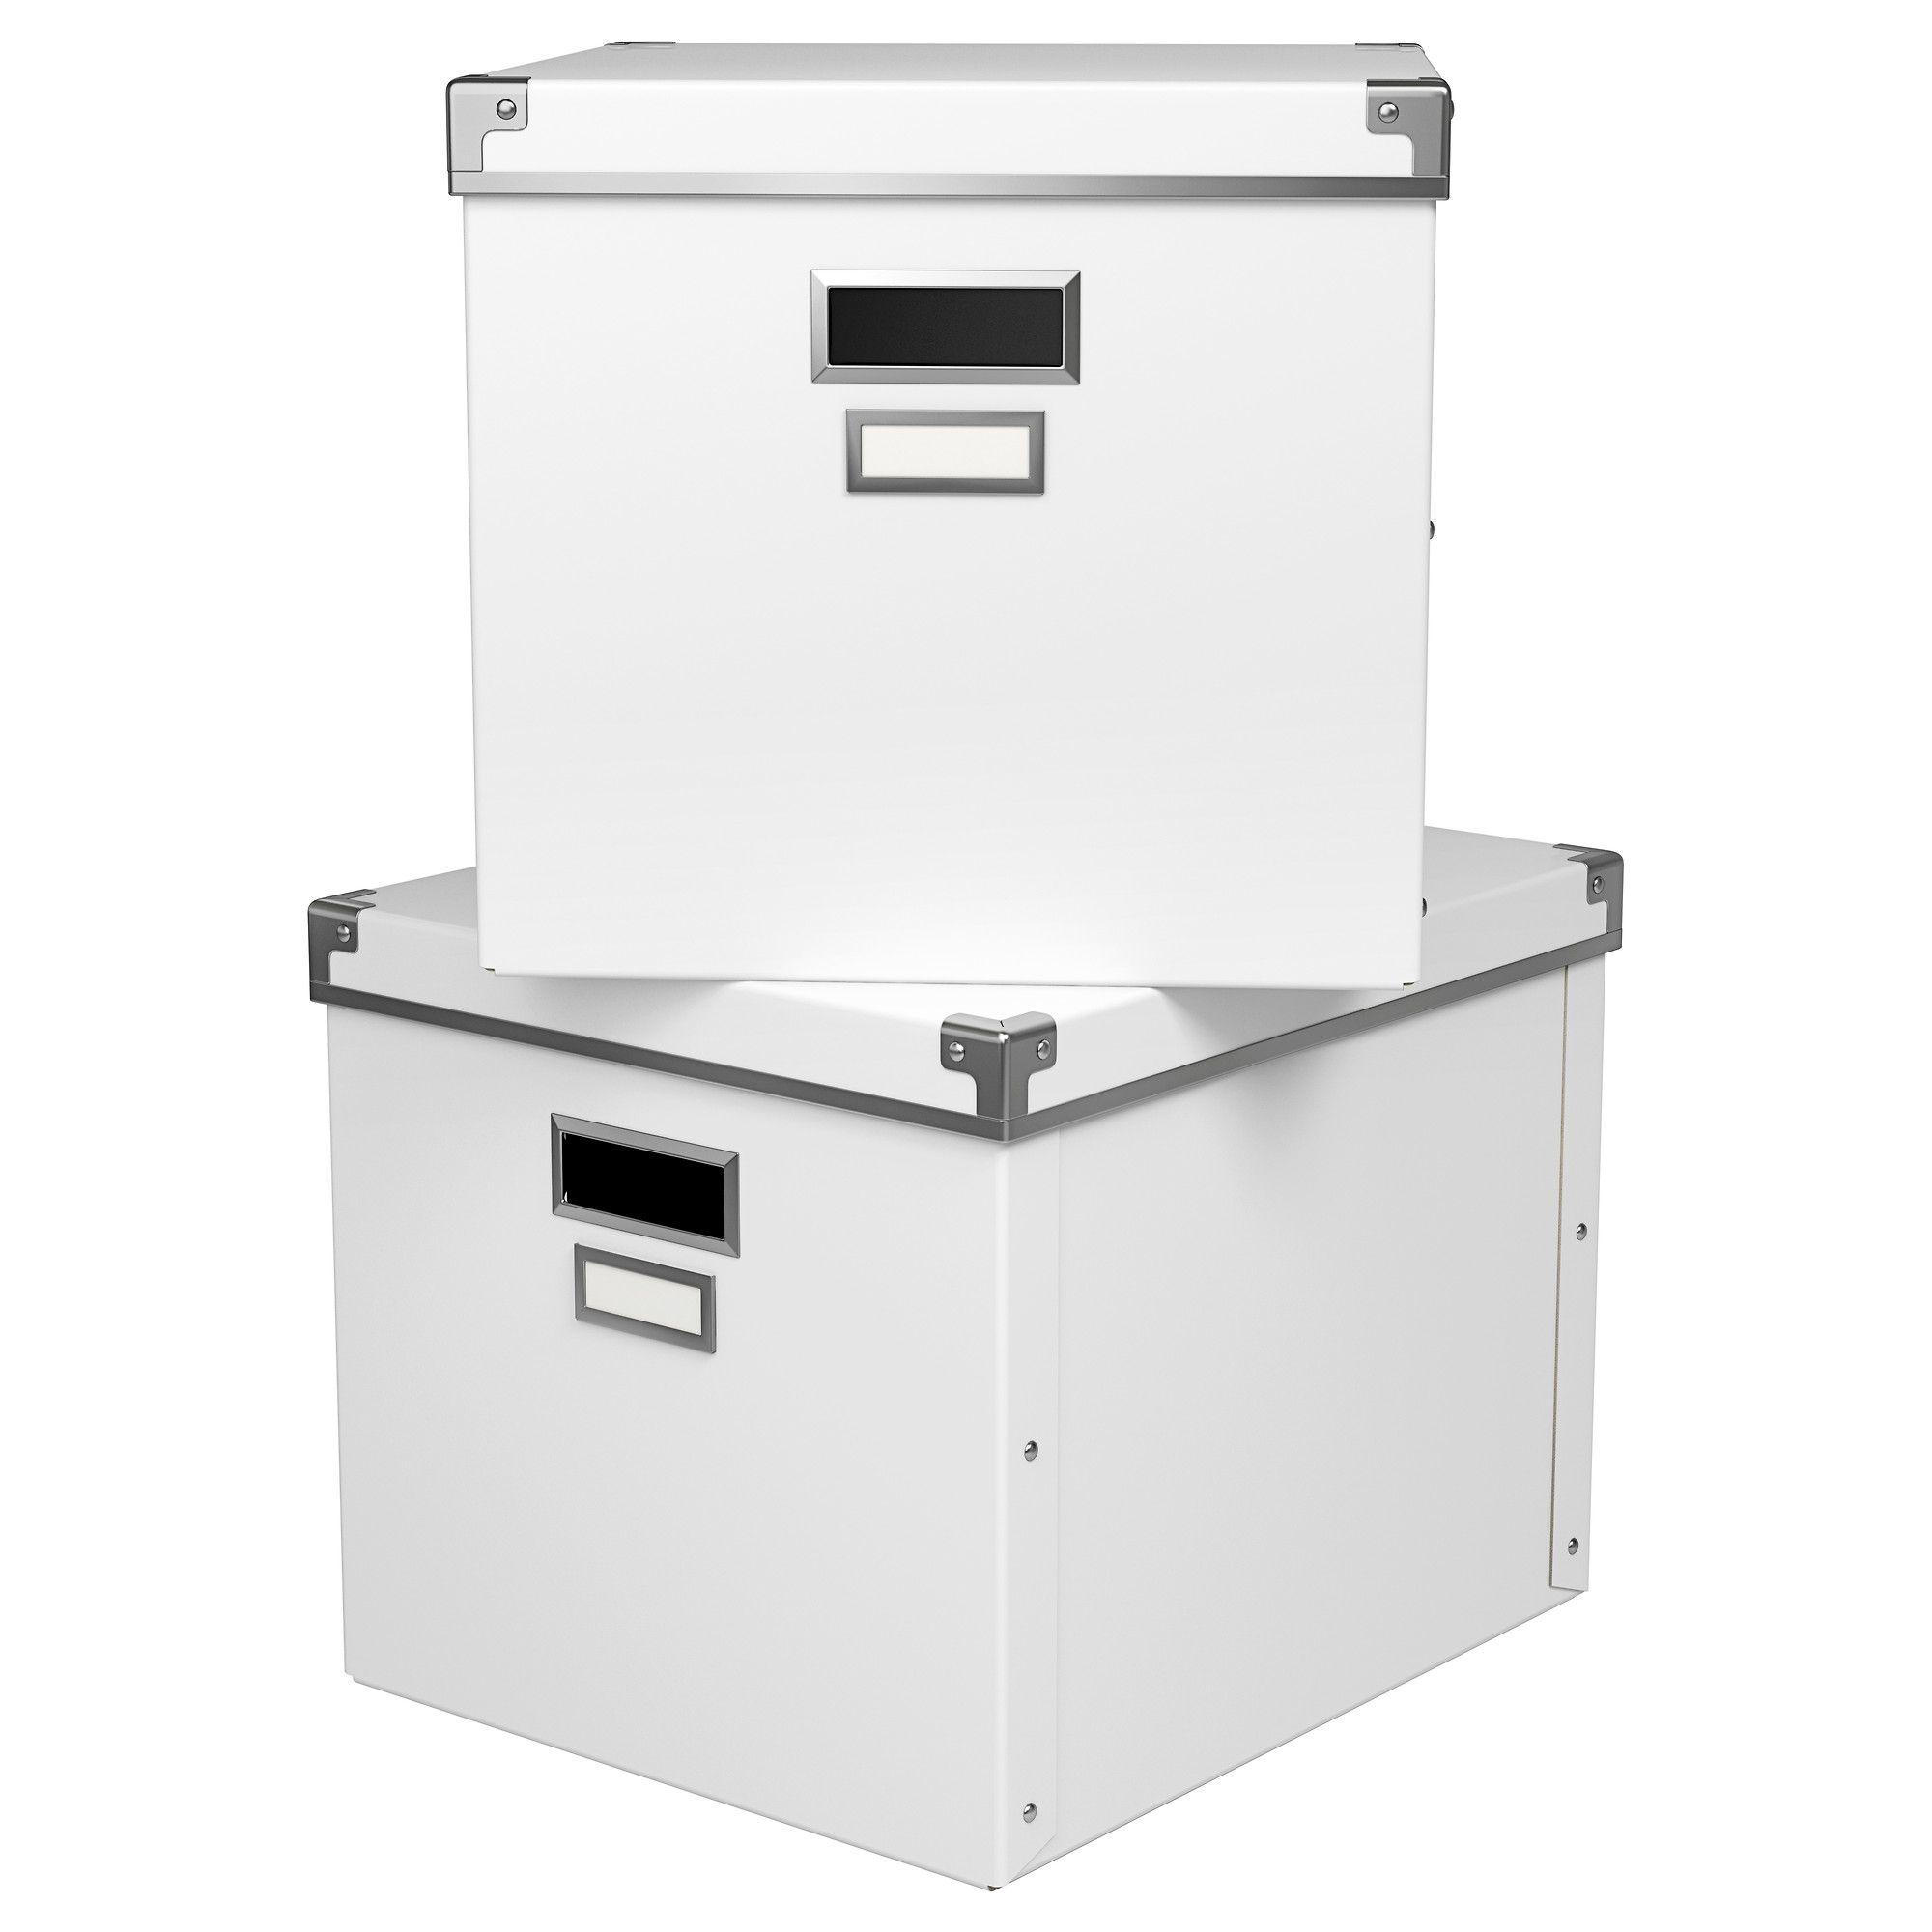 Ikea File Box Kassett Box With Lid White 13x15x11 Ikea  # Mueble Taquilla Ikea